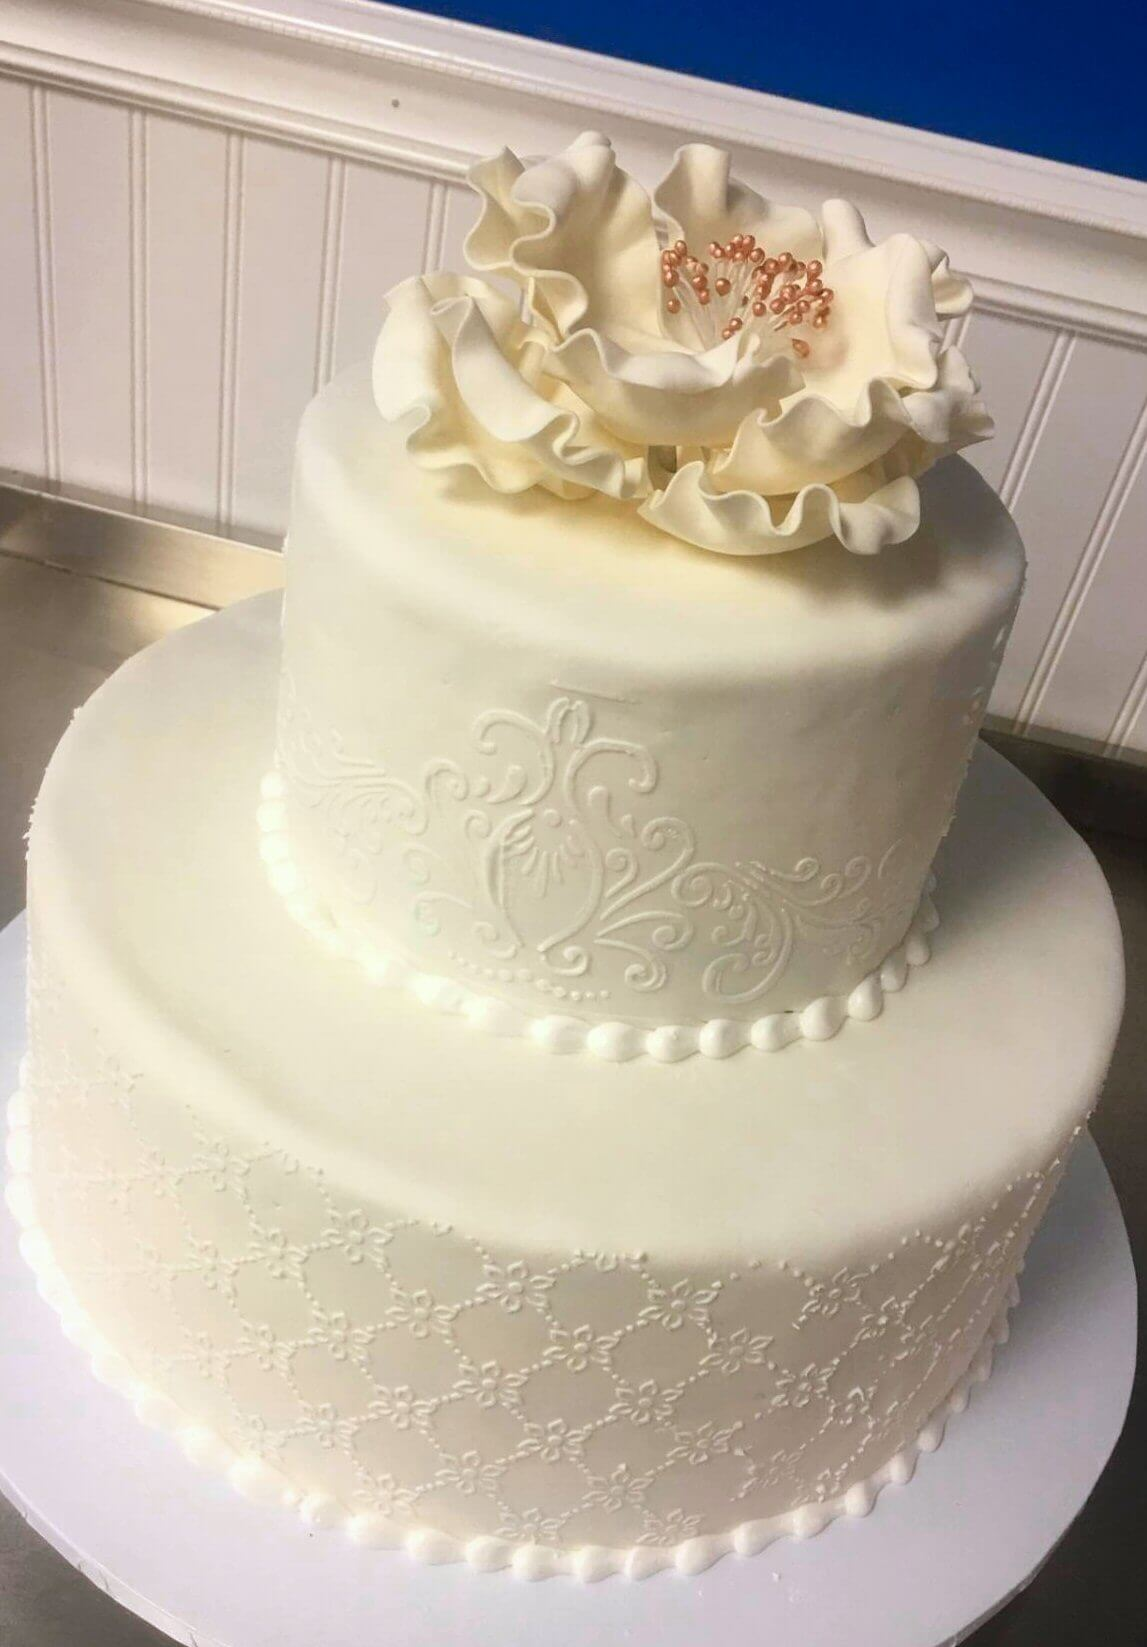 2-tiered white cake